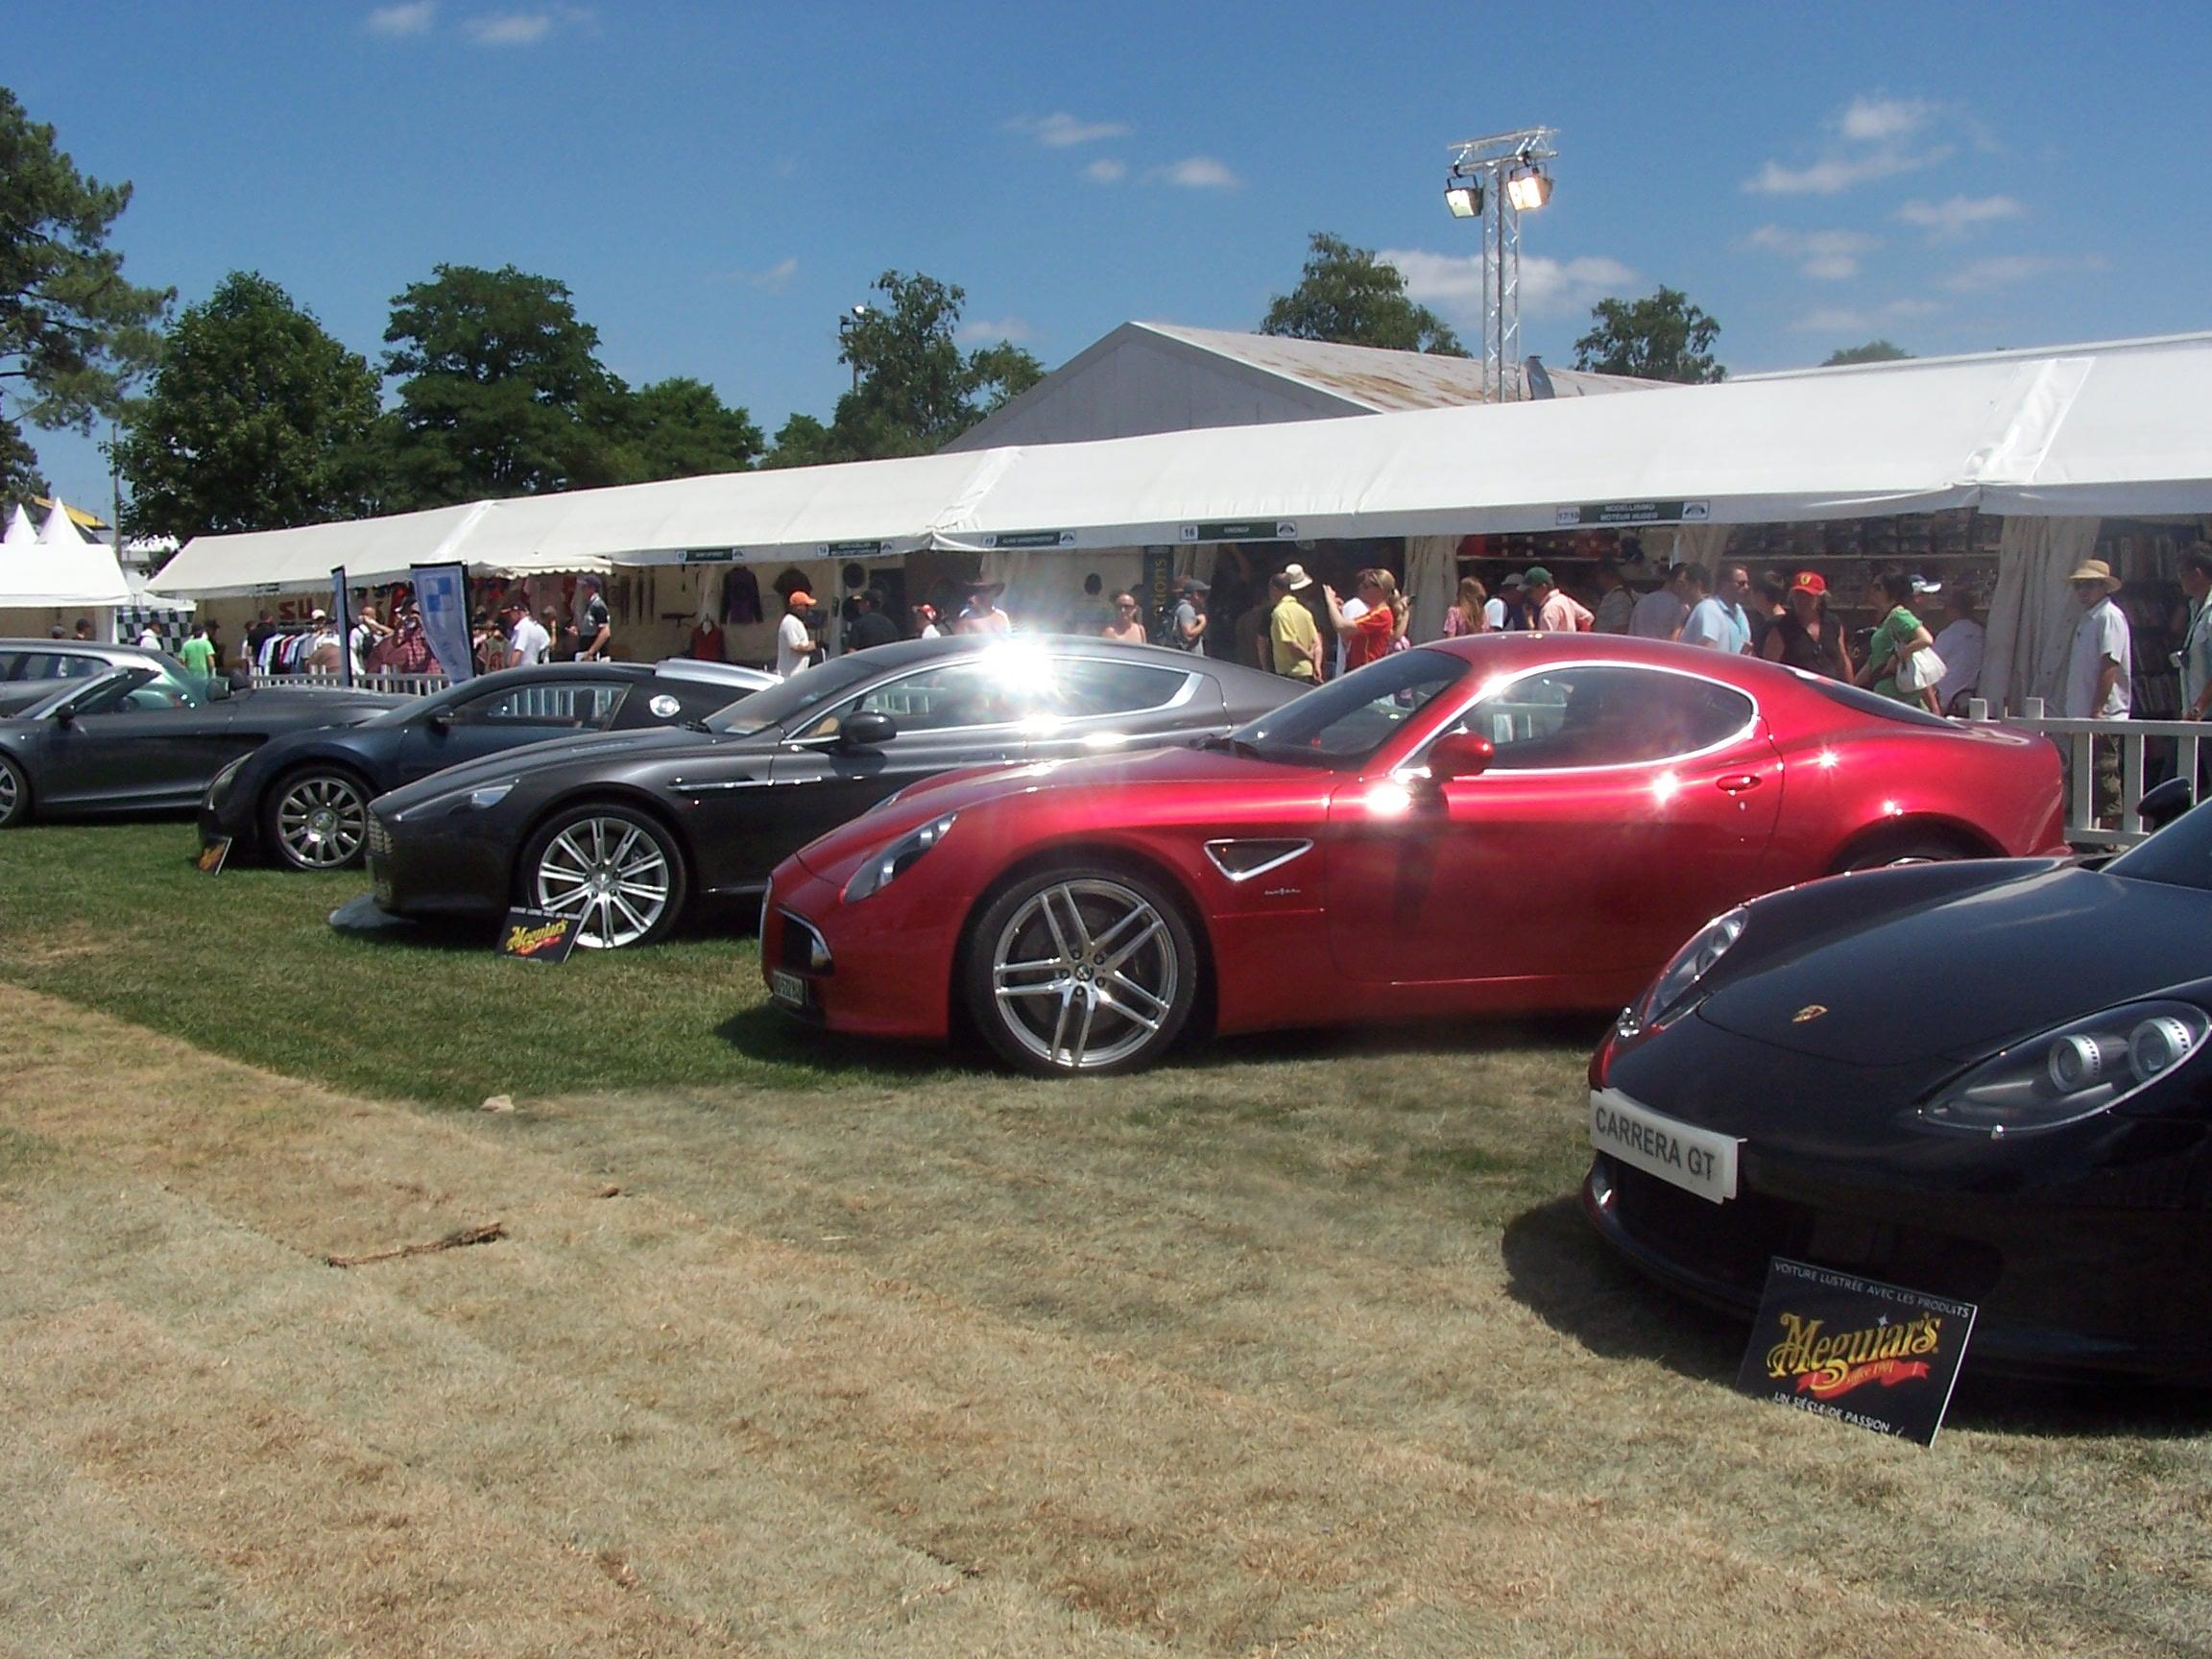 Le Mans Classic 2010 - 22.JPG